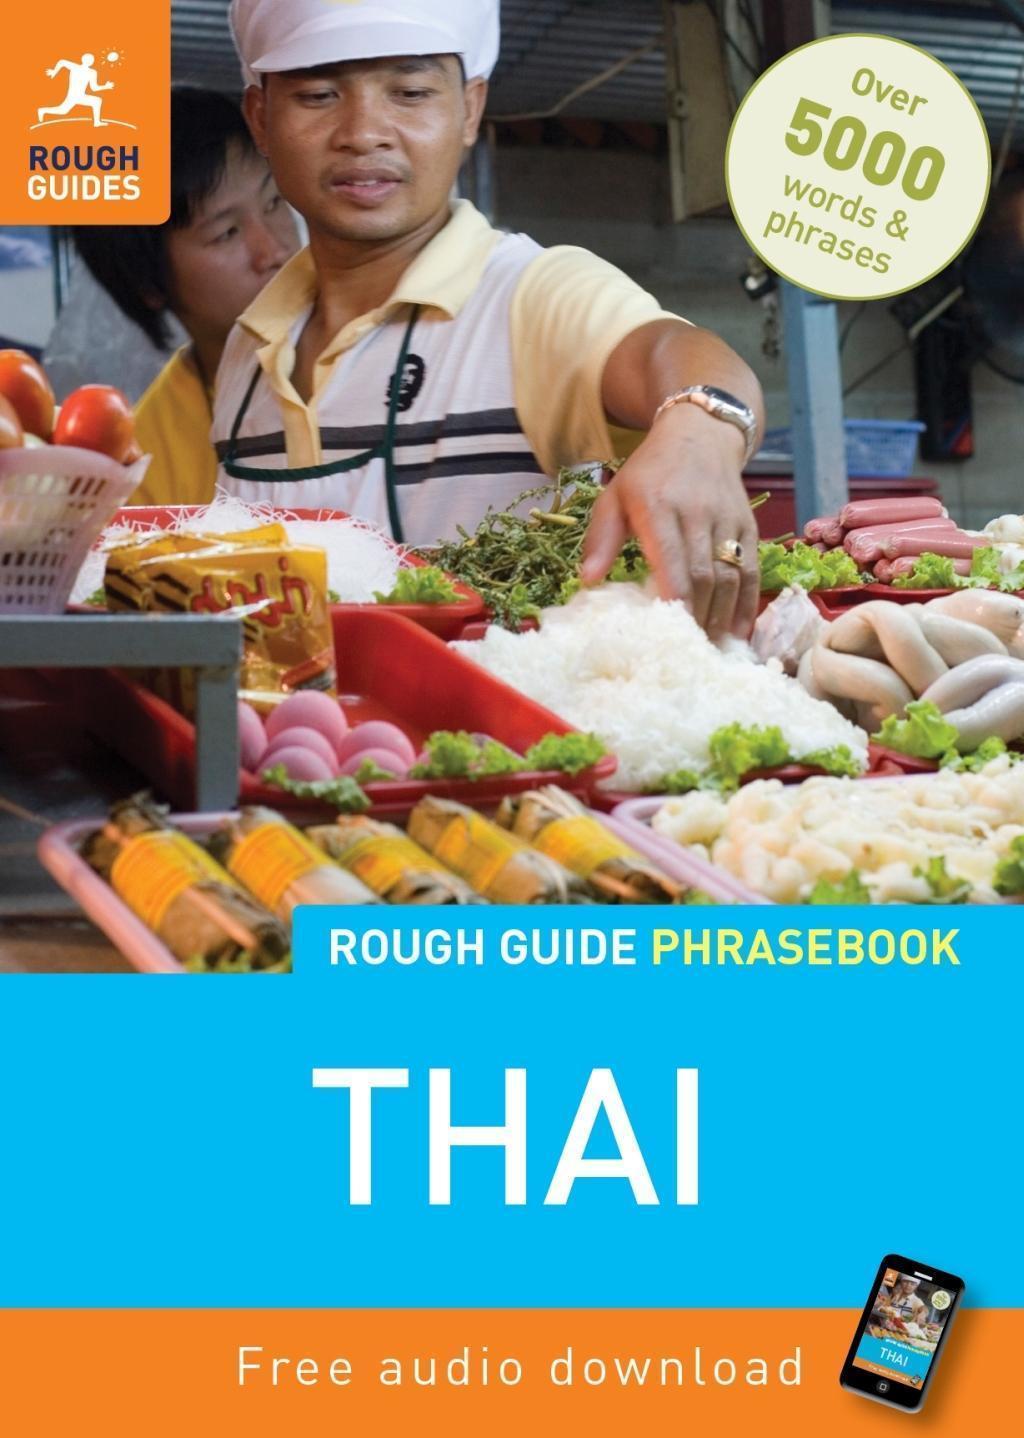 Rough Guide Phrasebook: Thai